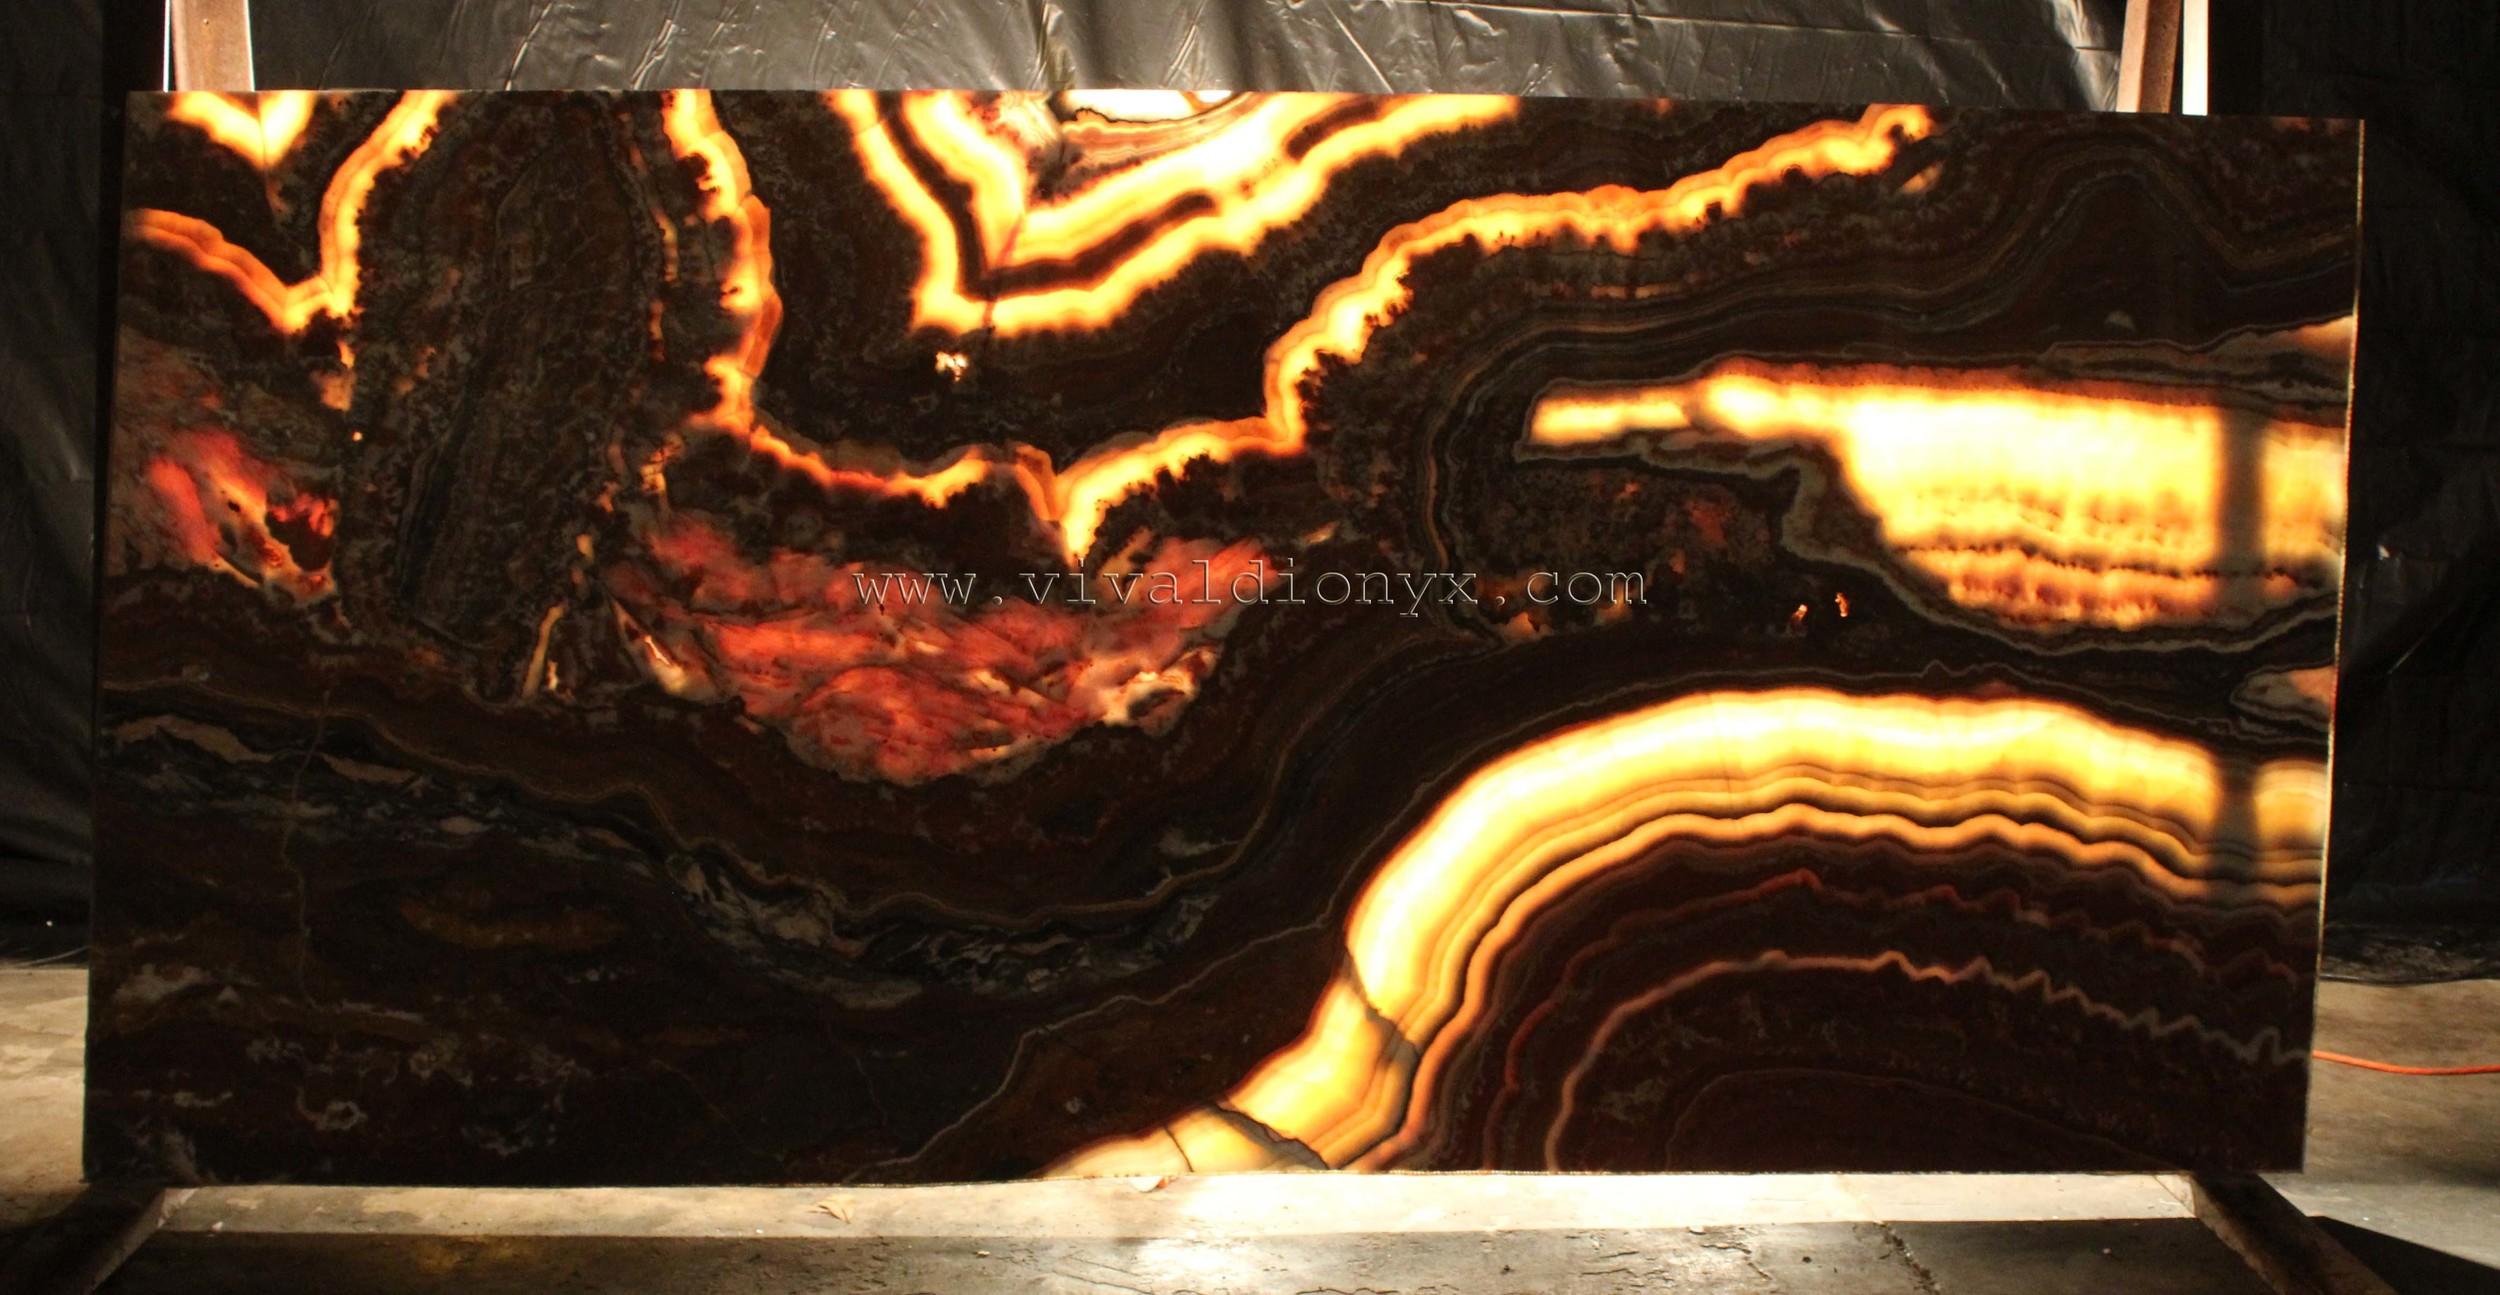 Onyx Fantastico - Light